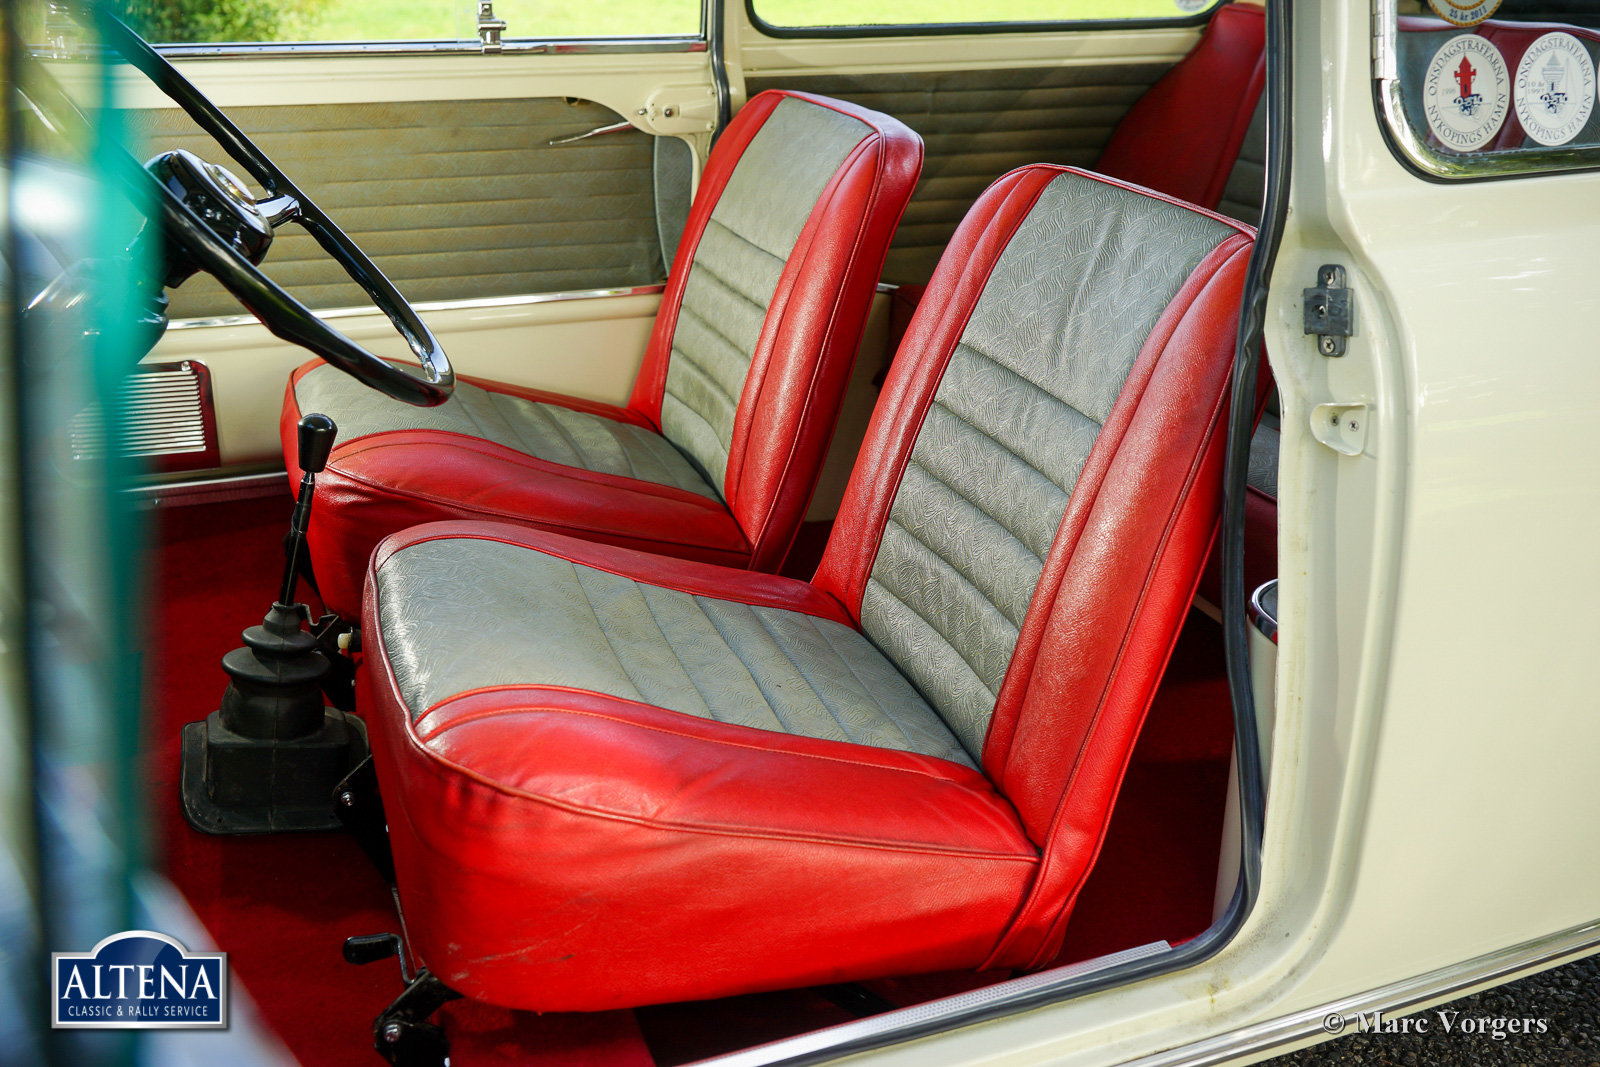 Mini/Morris Cooper 997 CC, 1962 For Sale (picture 2 of 6)